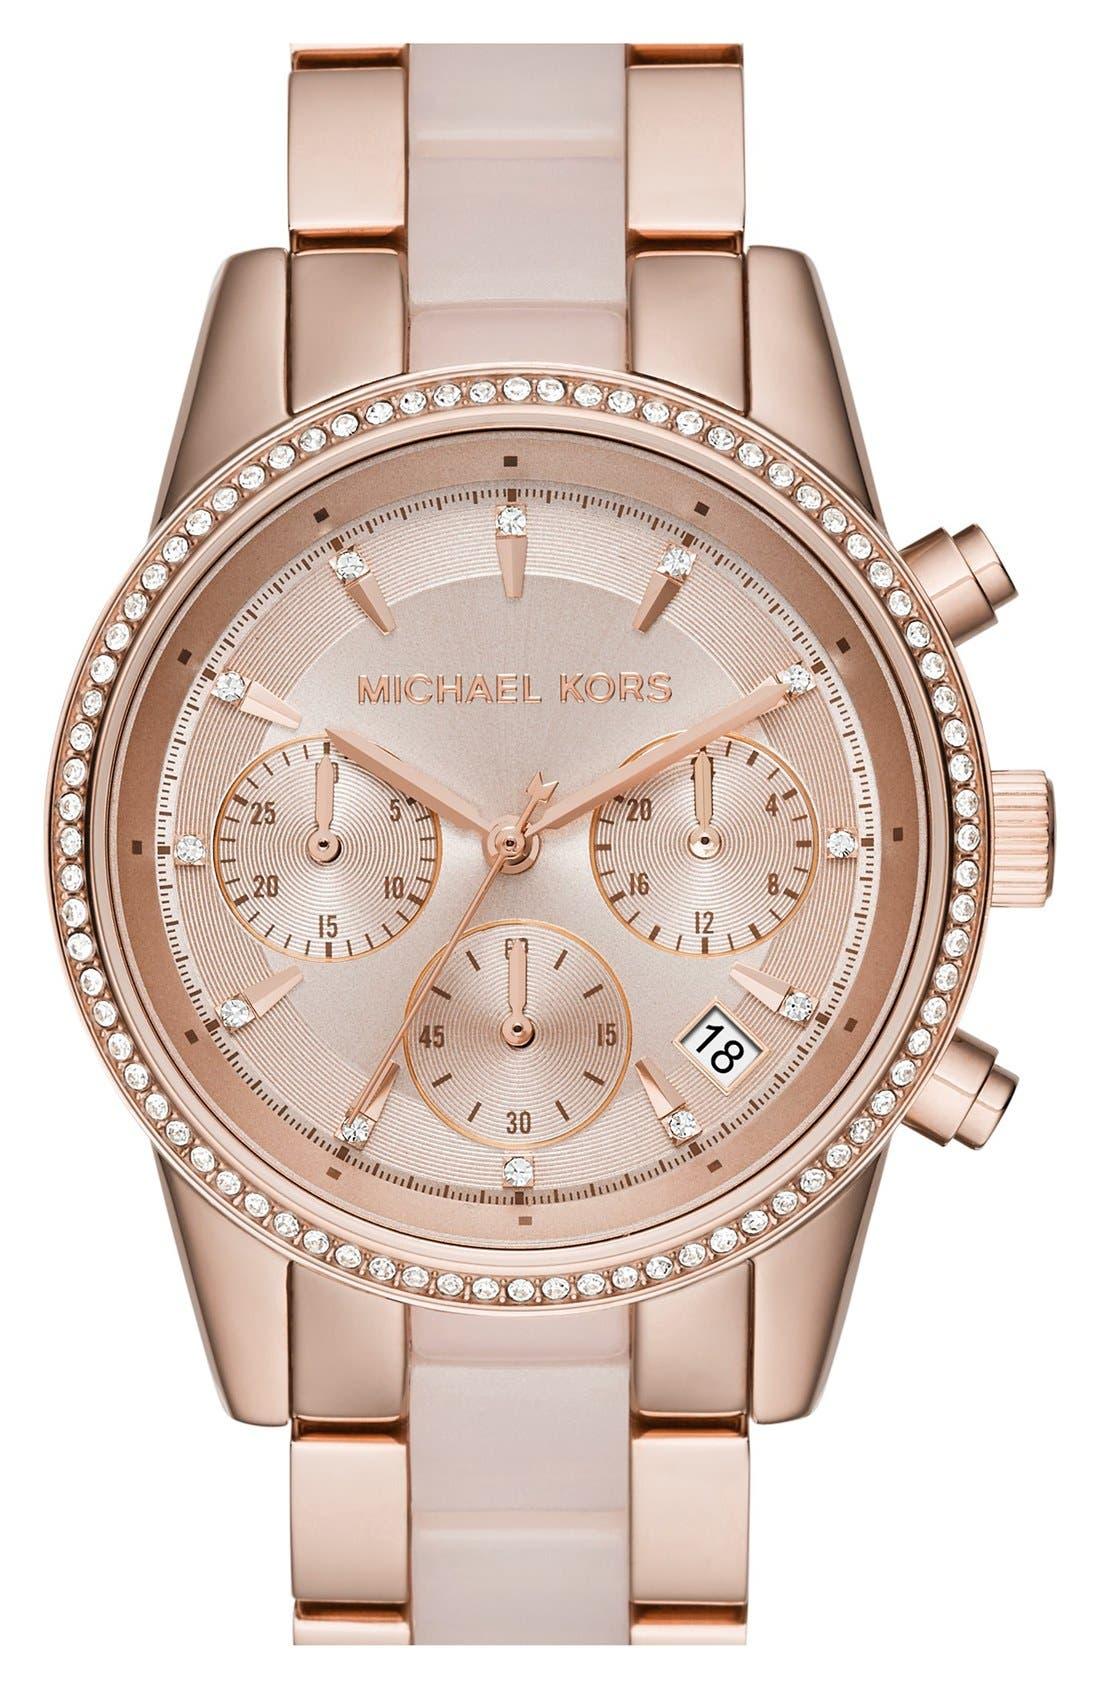 Main Image - Michael Kors 'Ritz' Chronograph Bracelet Watch, 37mm